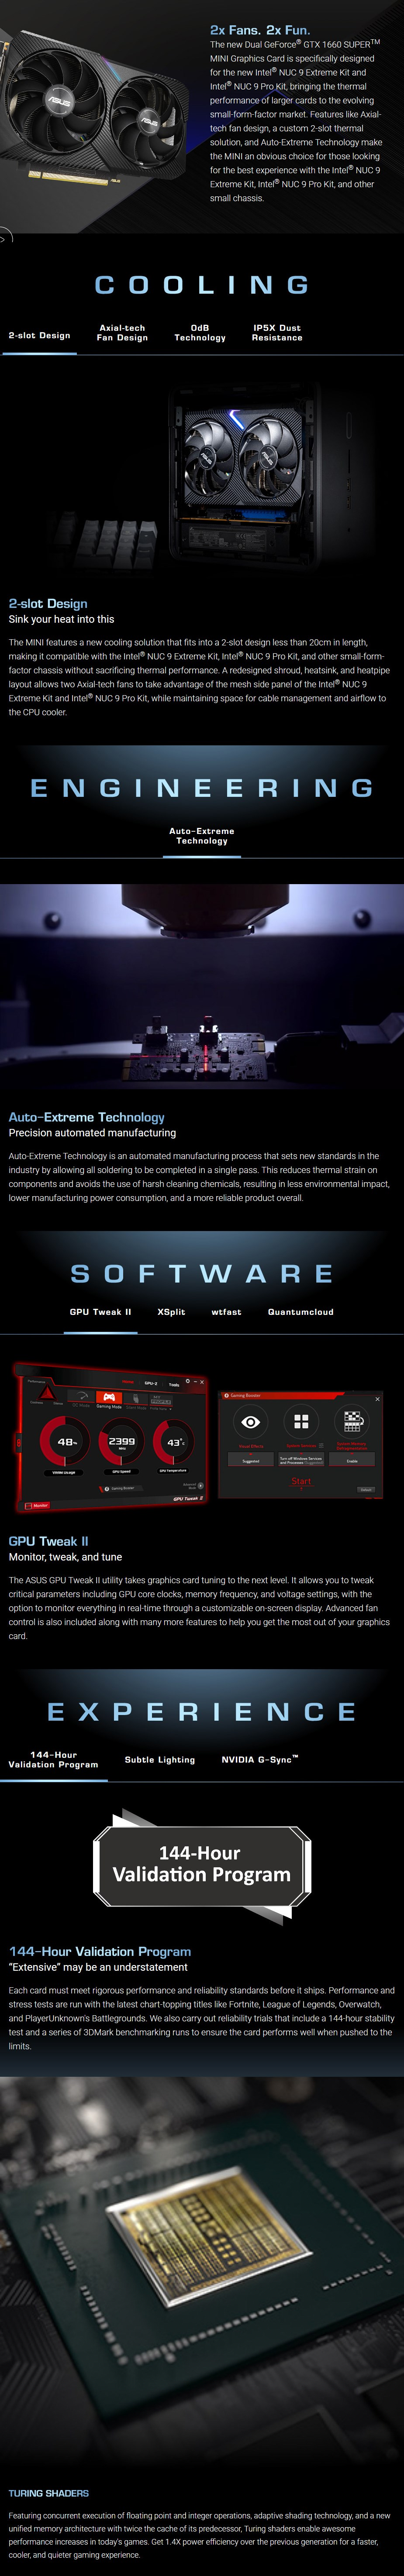 ASUS GeForce GTX 1660 SUPER Dual Mini OC 6GB Video Card - Overview 1